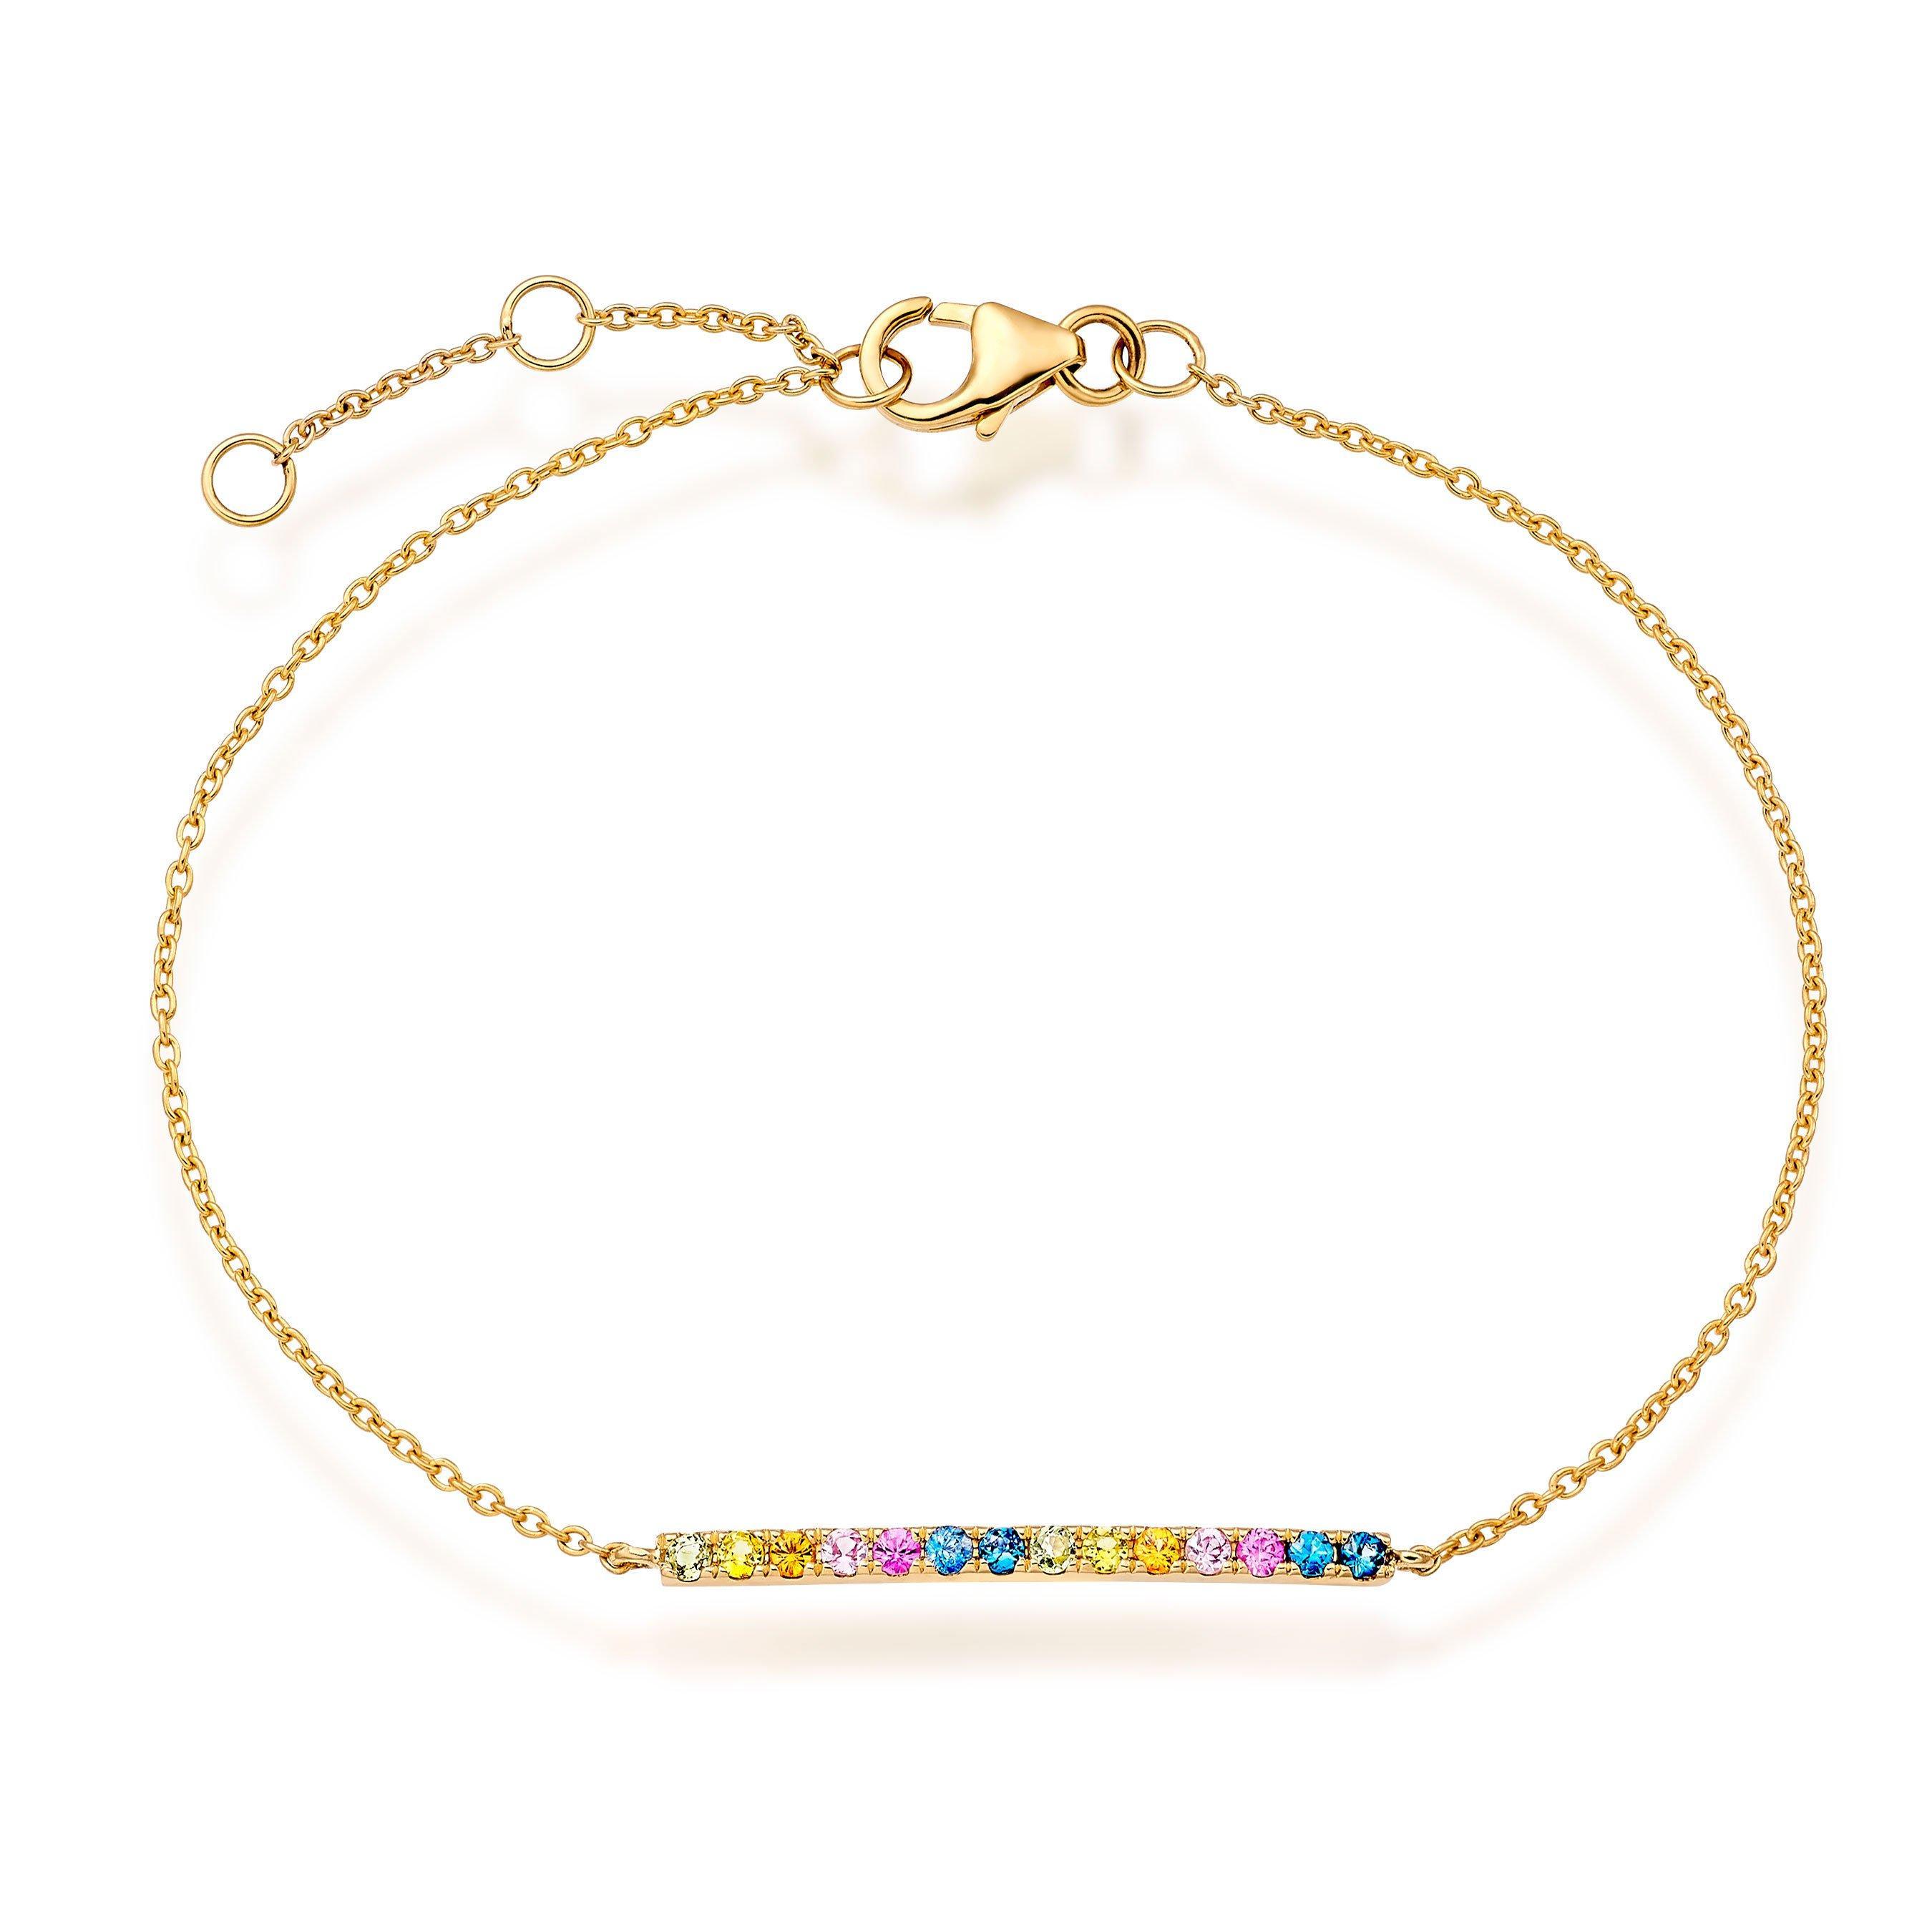 9ct Gold Multi-Coloured Sapphire Bracelet